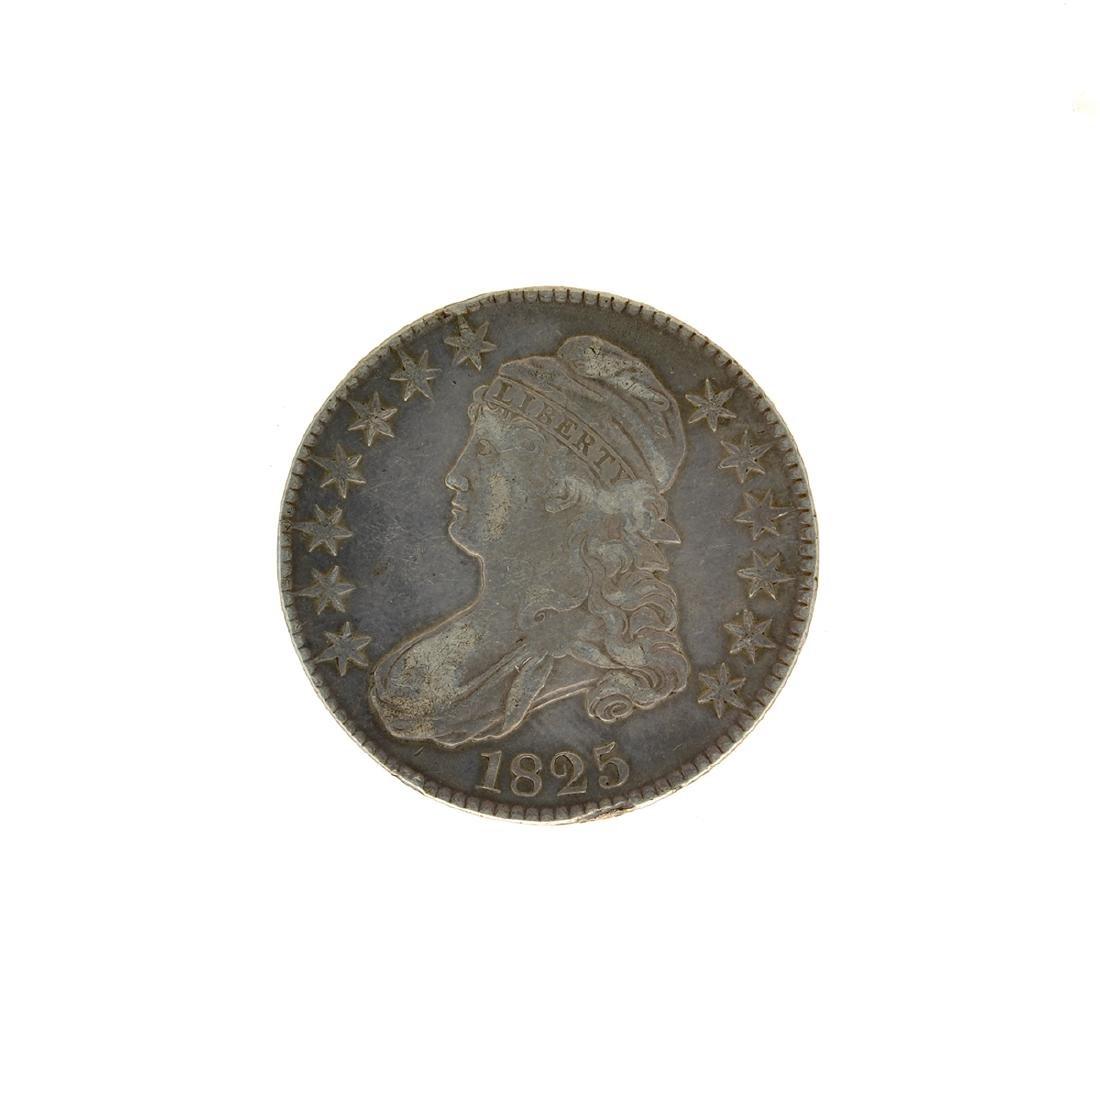 1825 Bust Half Dollar Coin